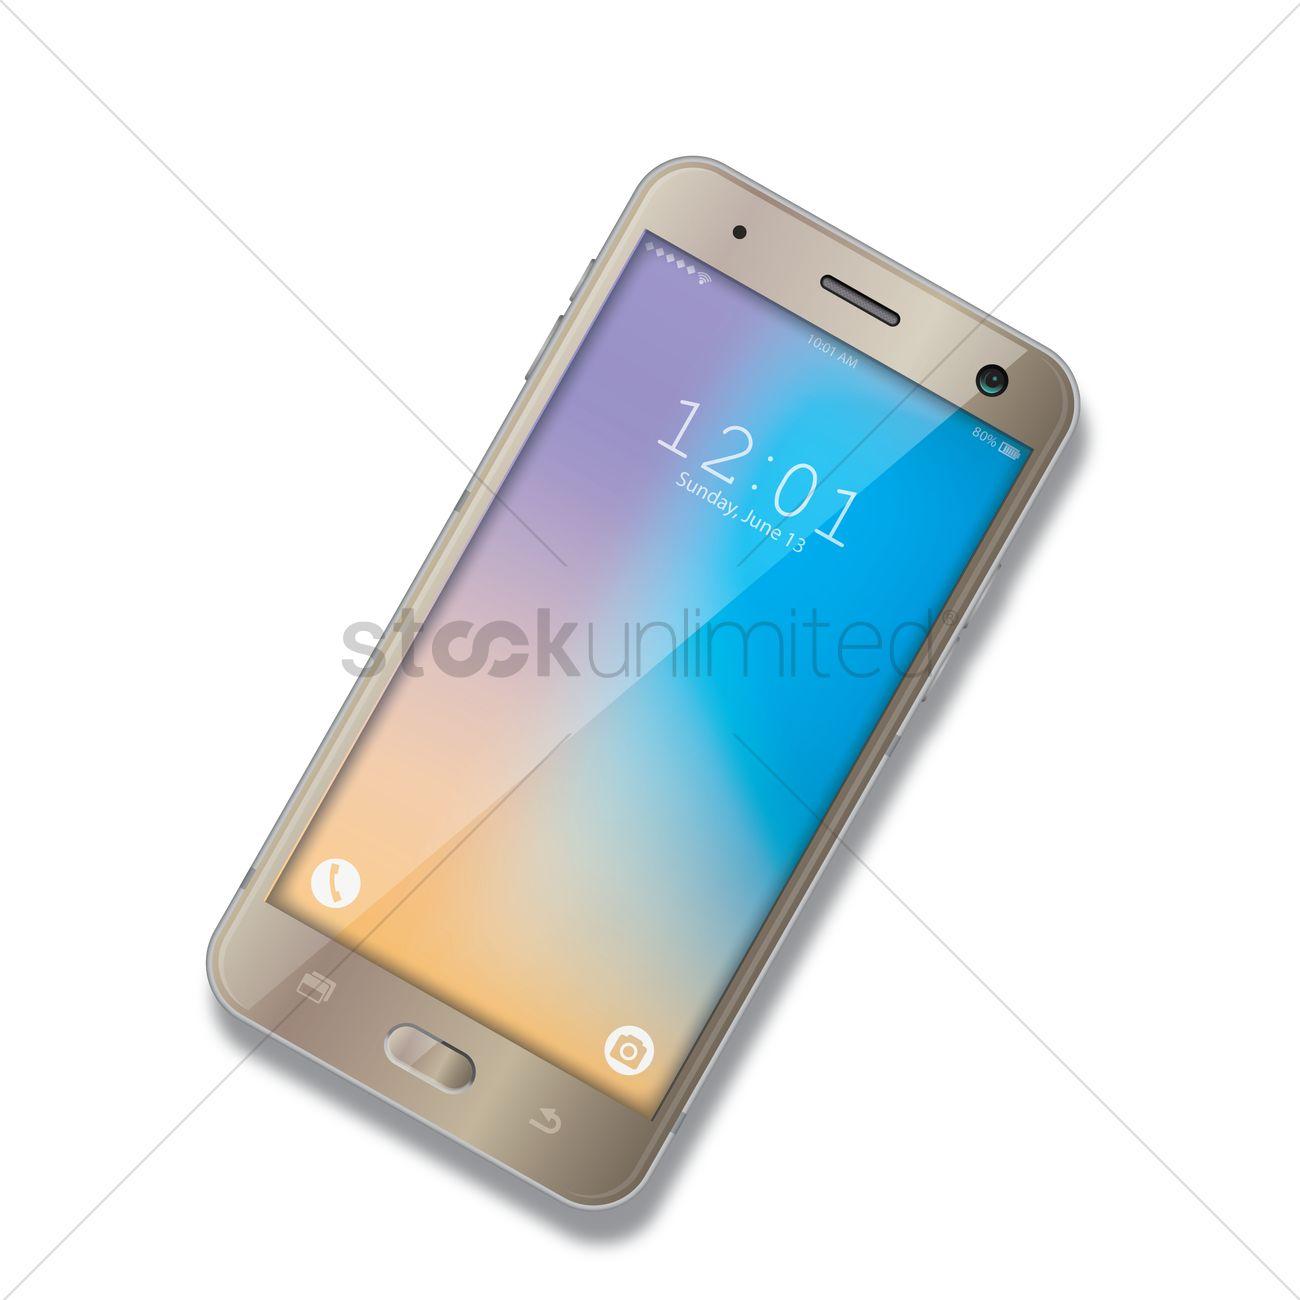 Smartphone Vector Image - 1625455 | StockUnlimited